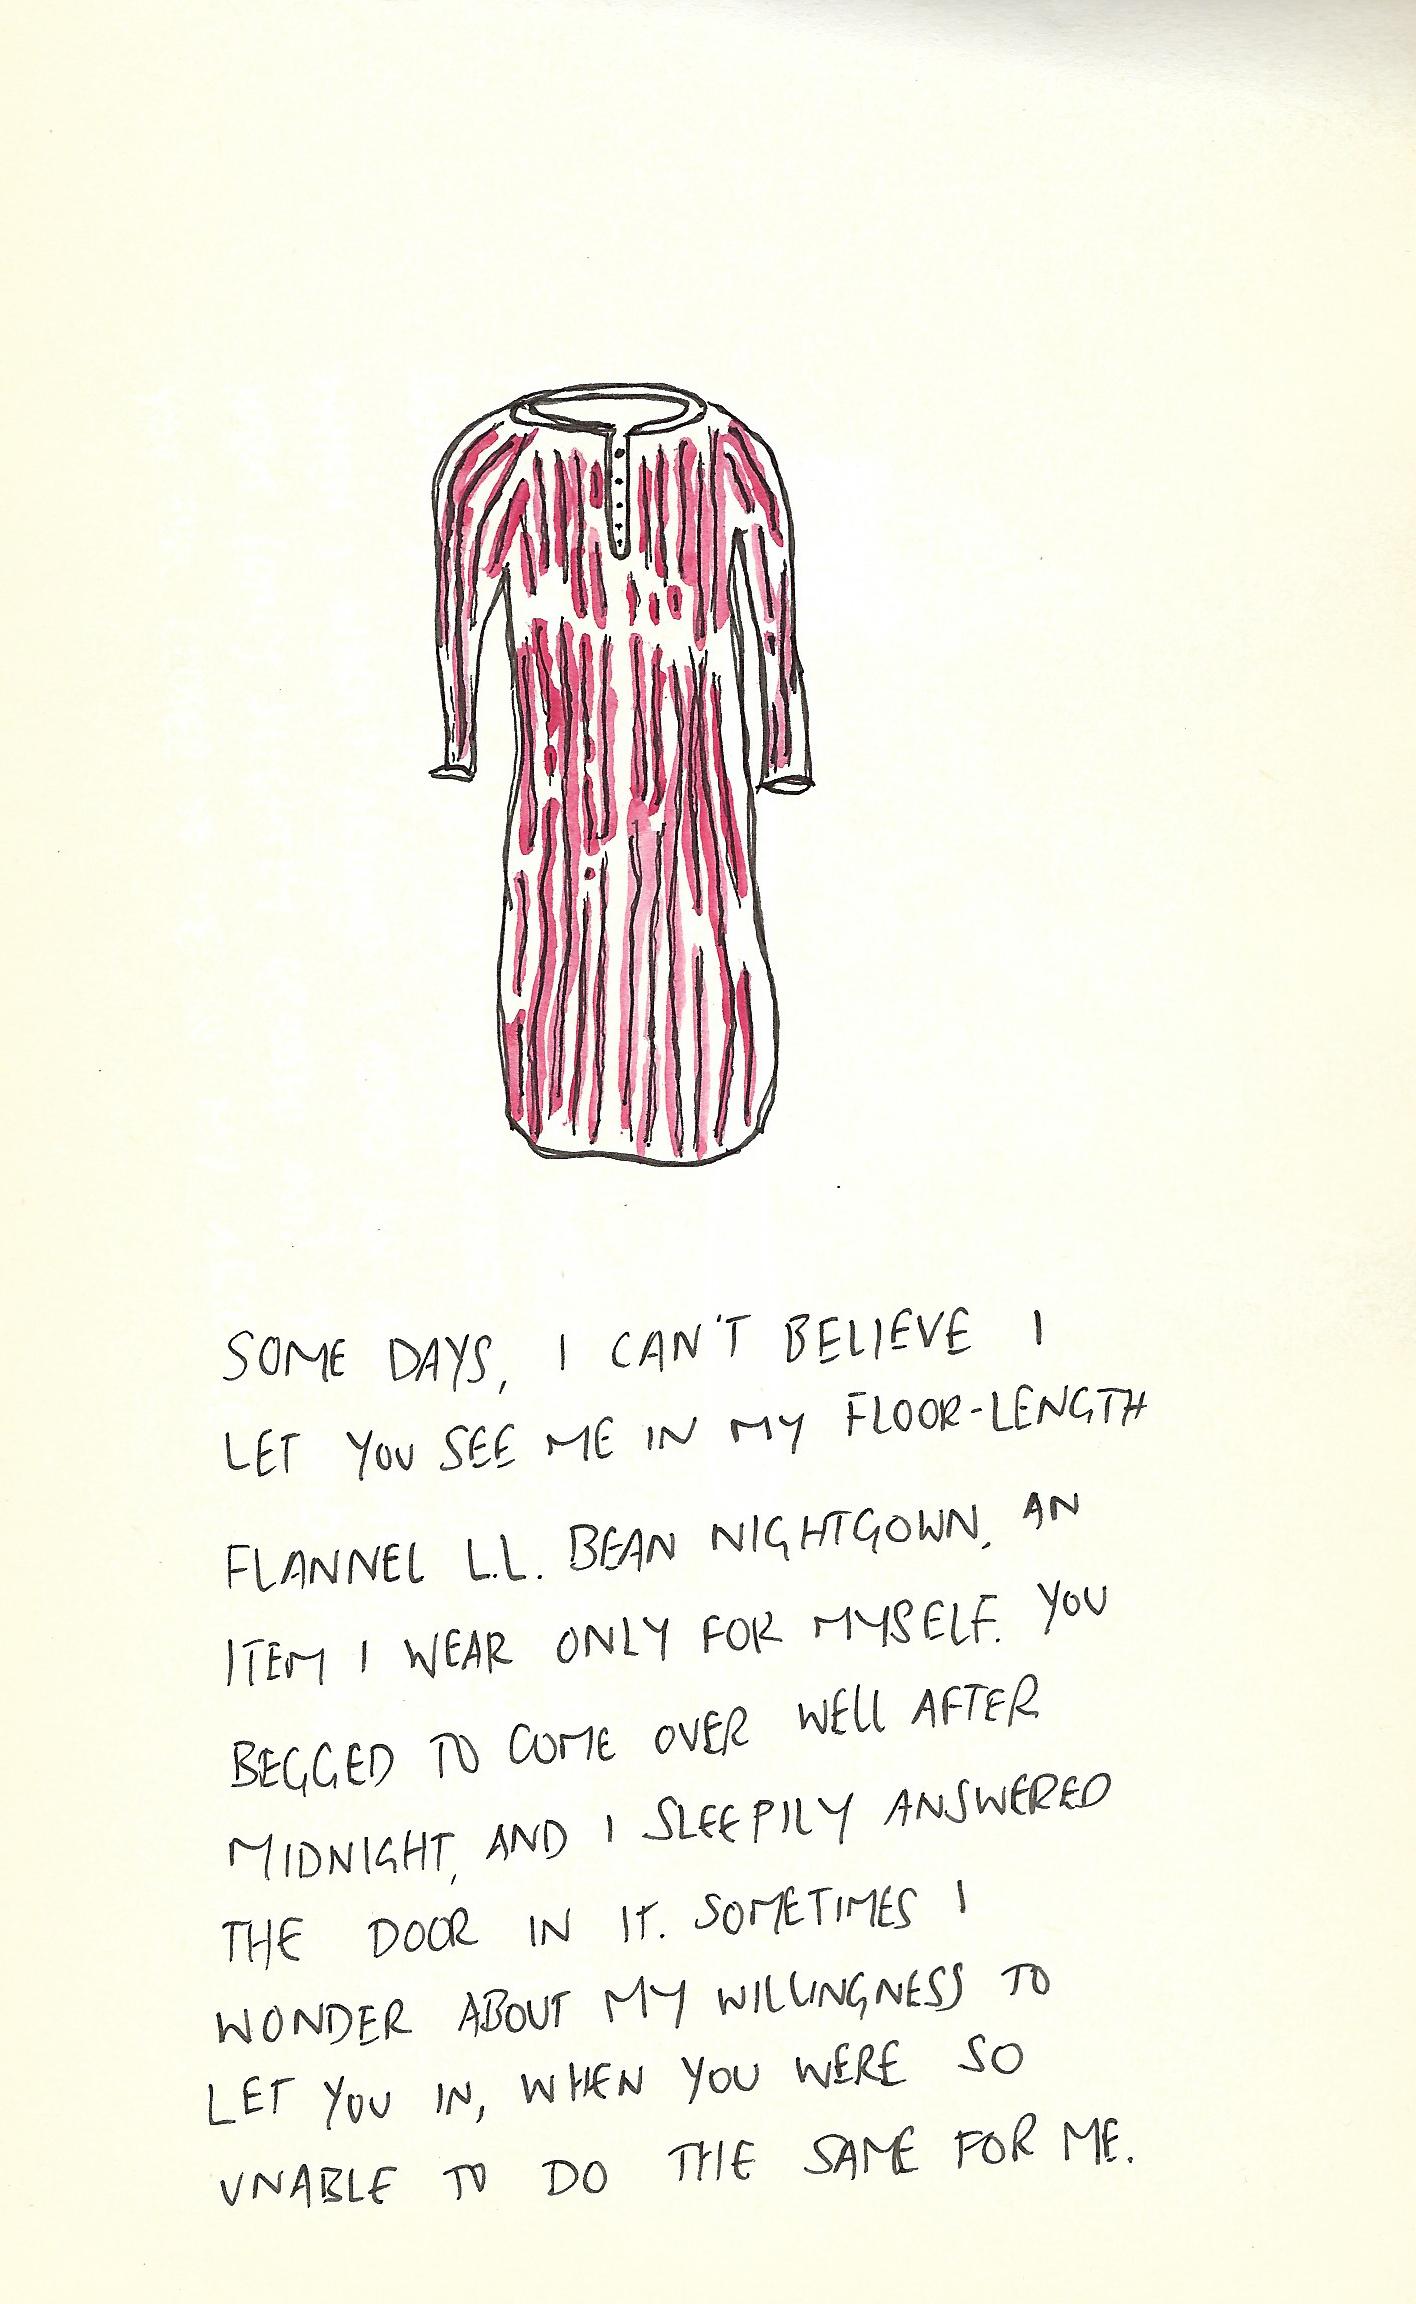 07 LL Bean Nightgown.jpeg